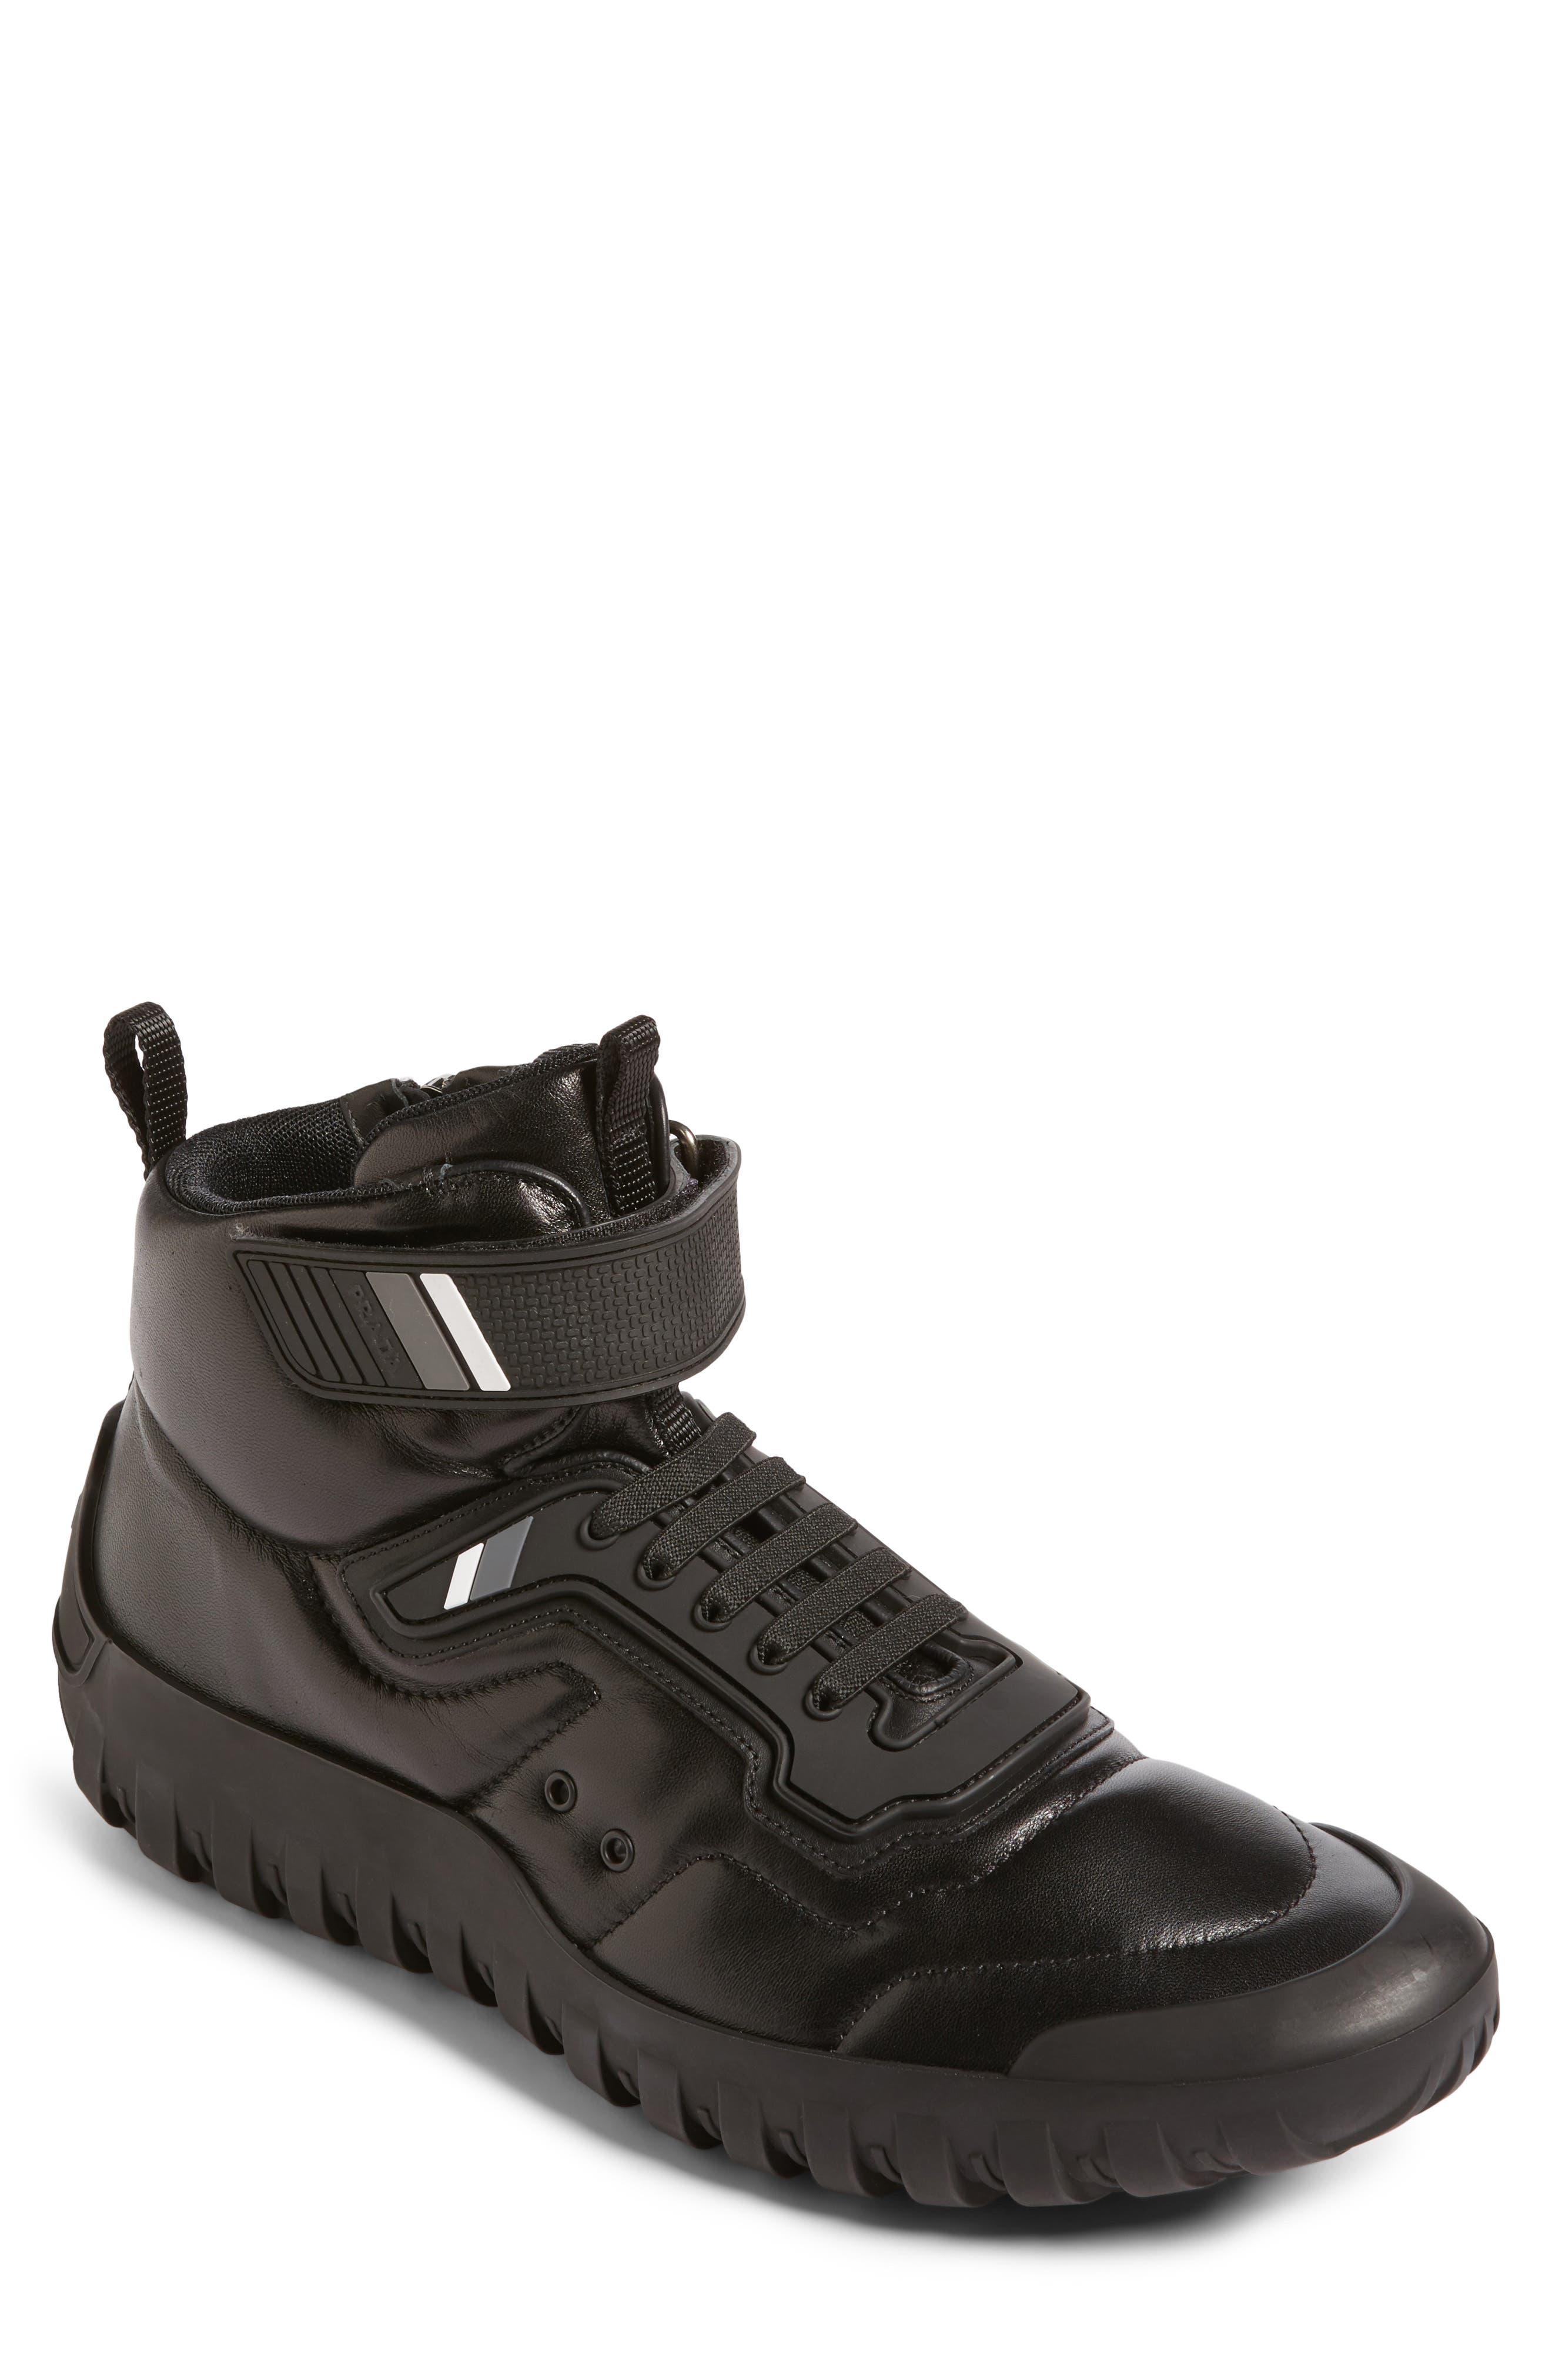 Main Image - Prada Linea Rossa Tech Strap Sneaker (Men)